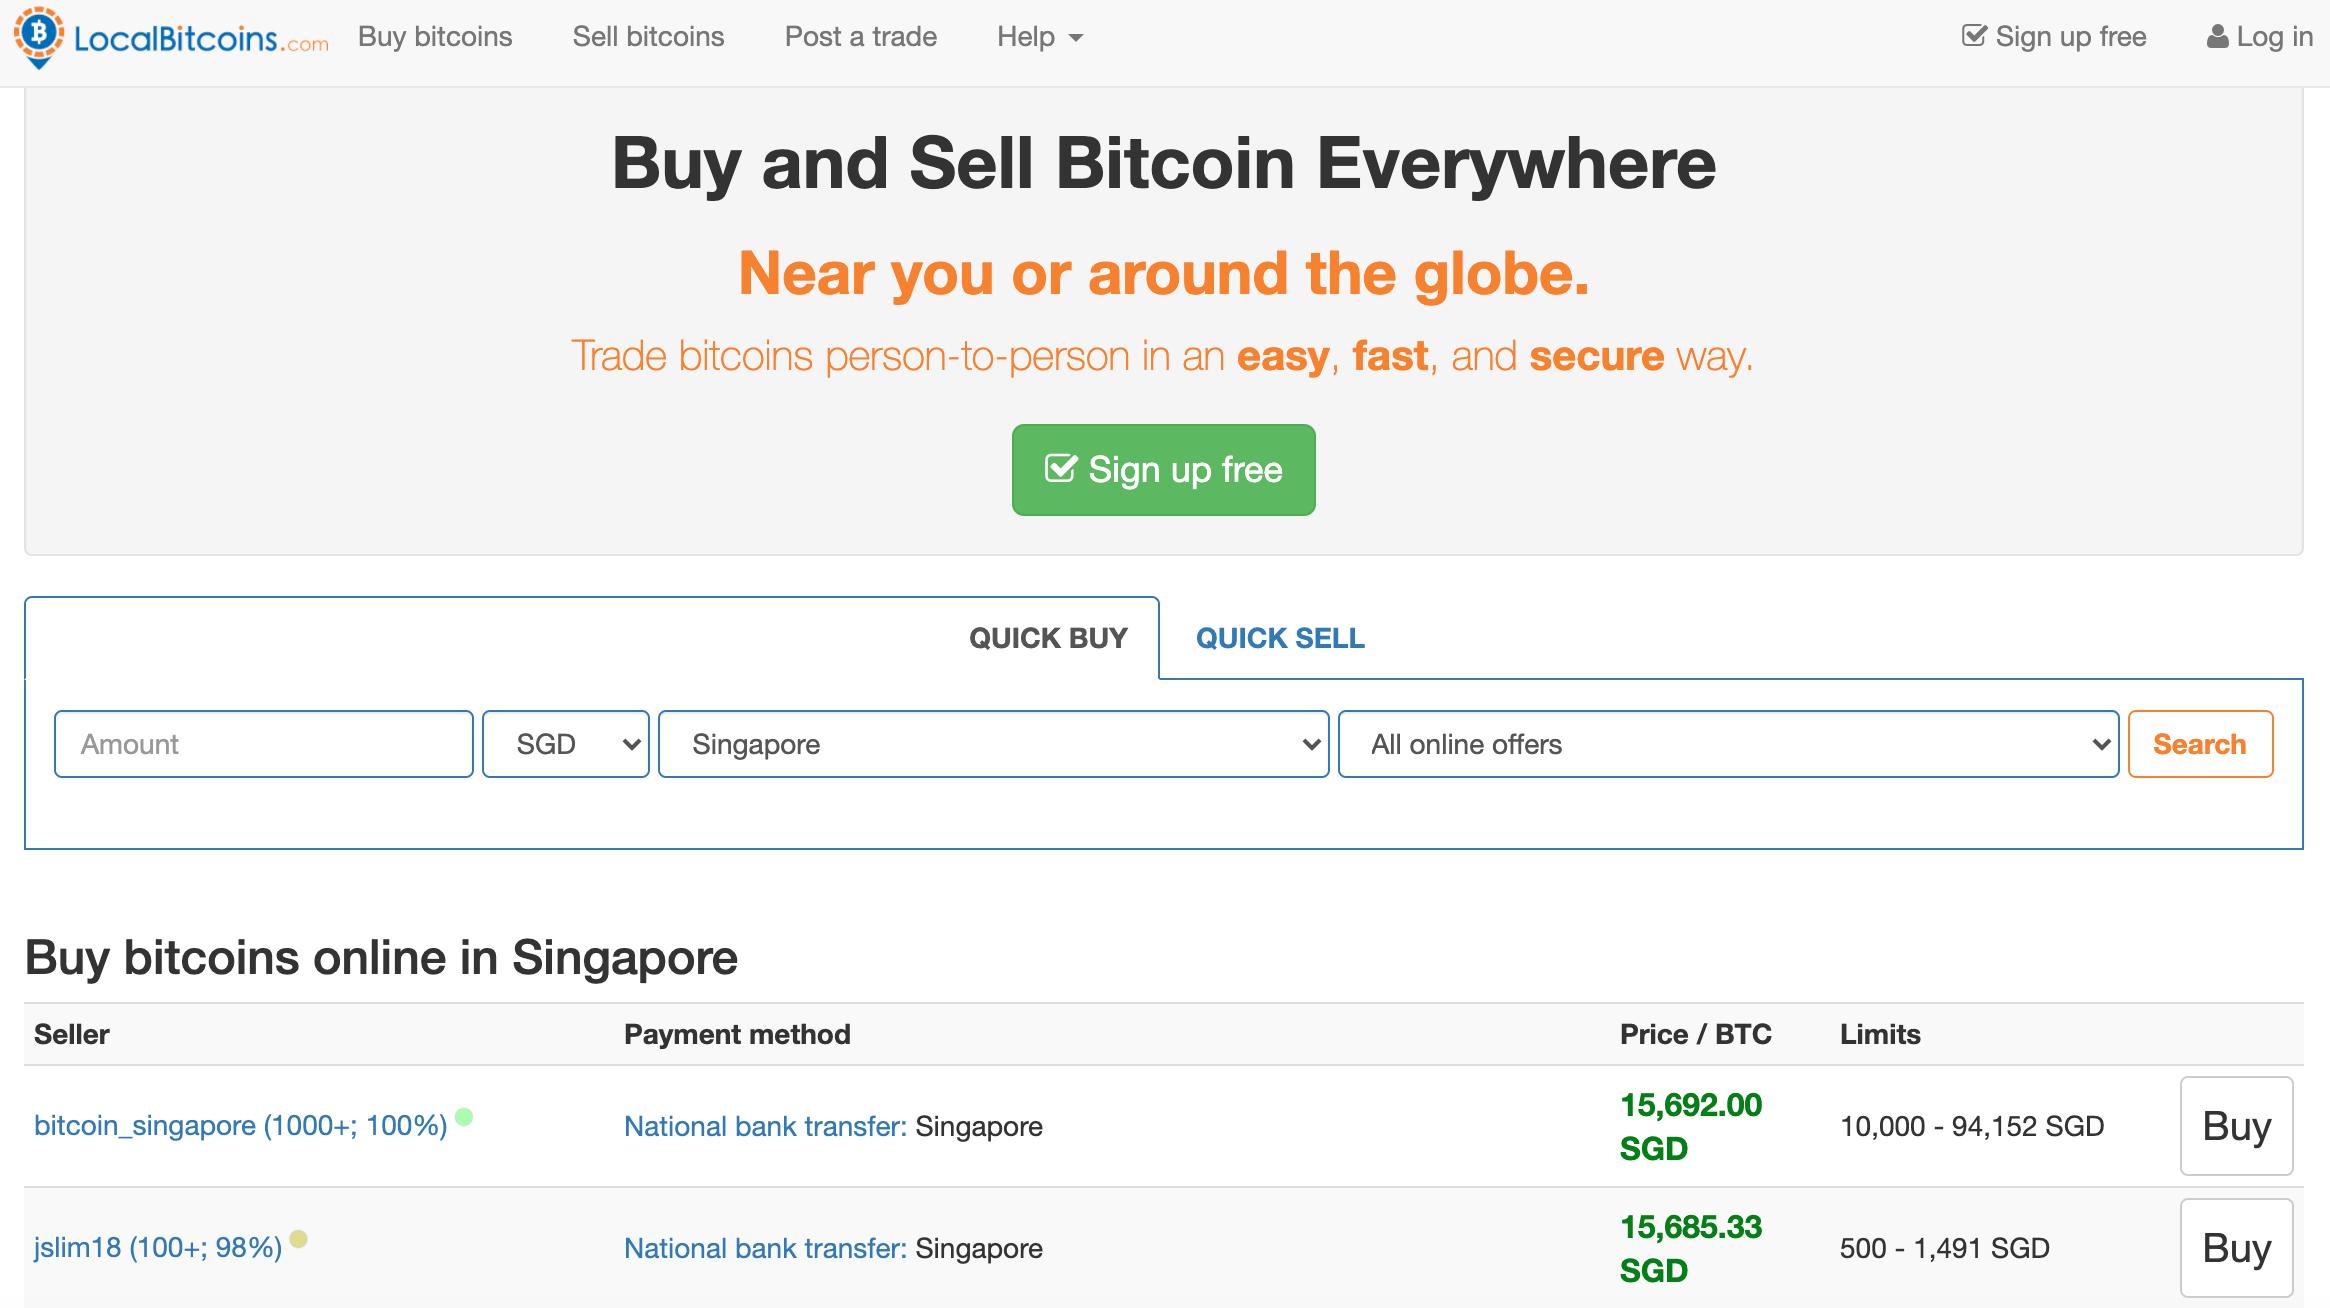 Cum sa faci bani online fara investitii: idei si metode - J.D.M ®, cum să faci bani rapid online